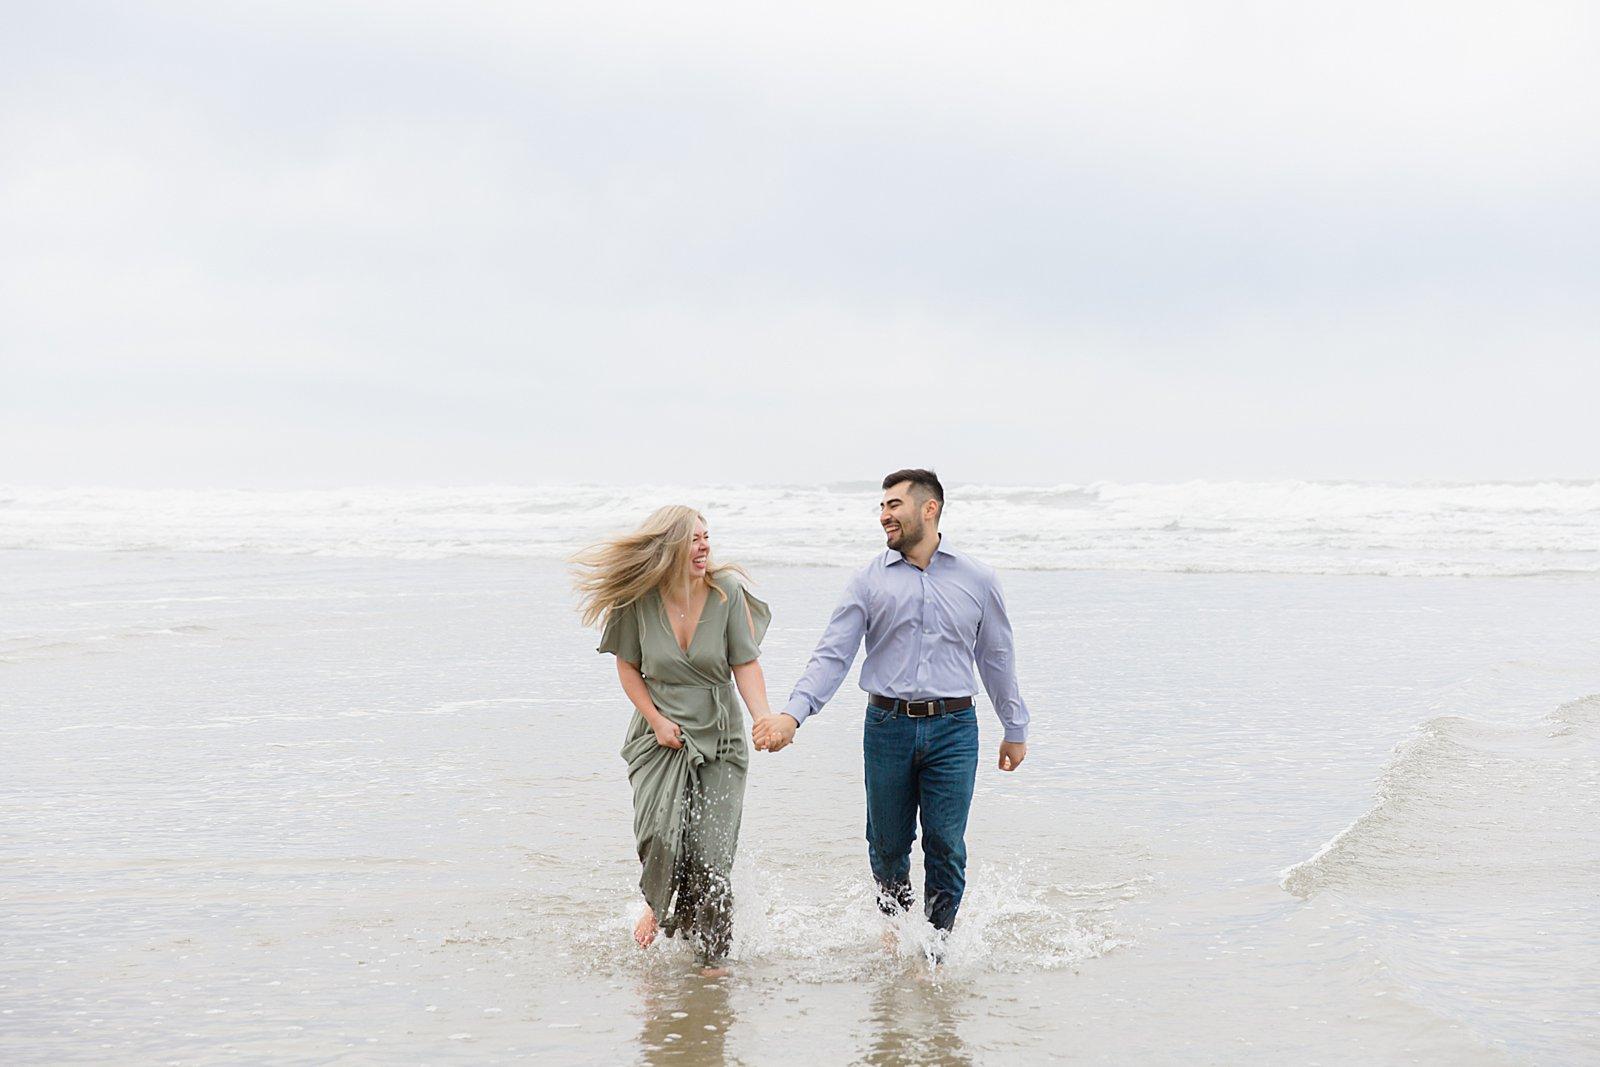 Rebekah Leona Photography | Cape Kiwanda | Beach Photo Session | Oregon Coast Engagement Session | Beach Photos